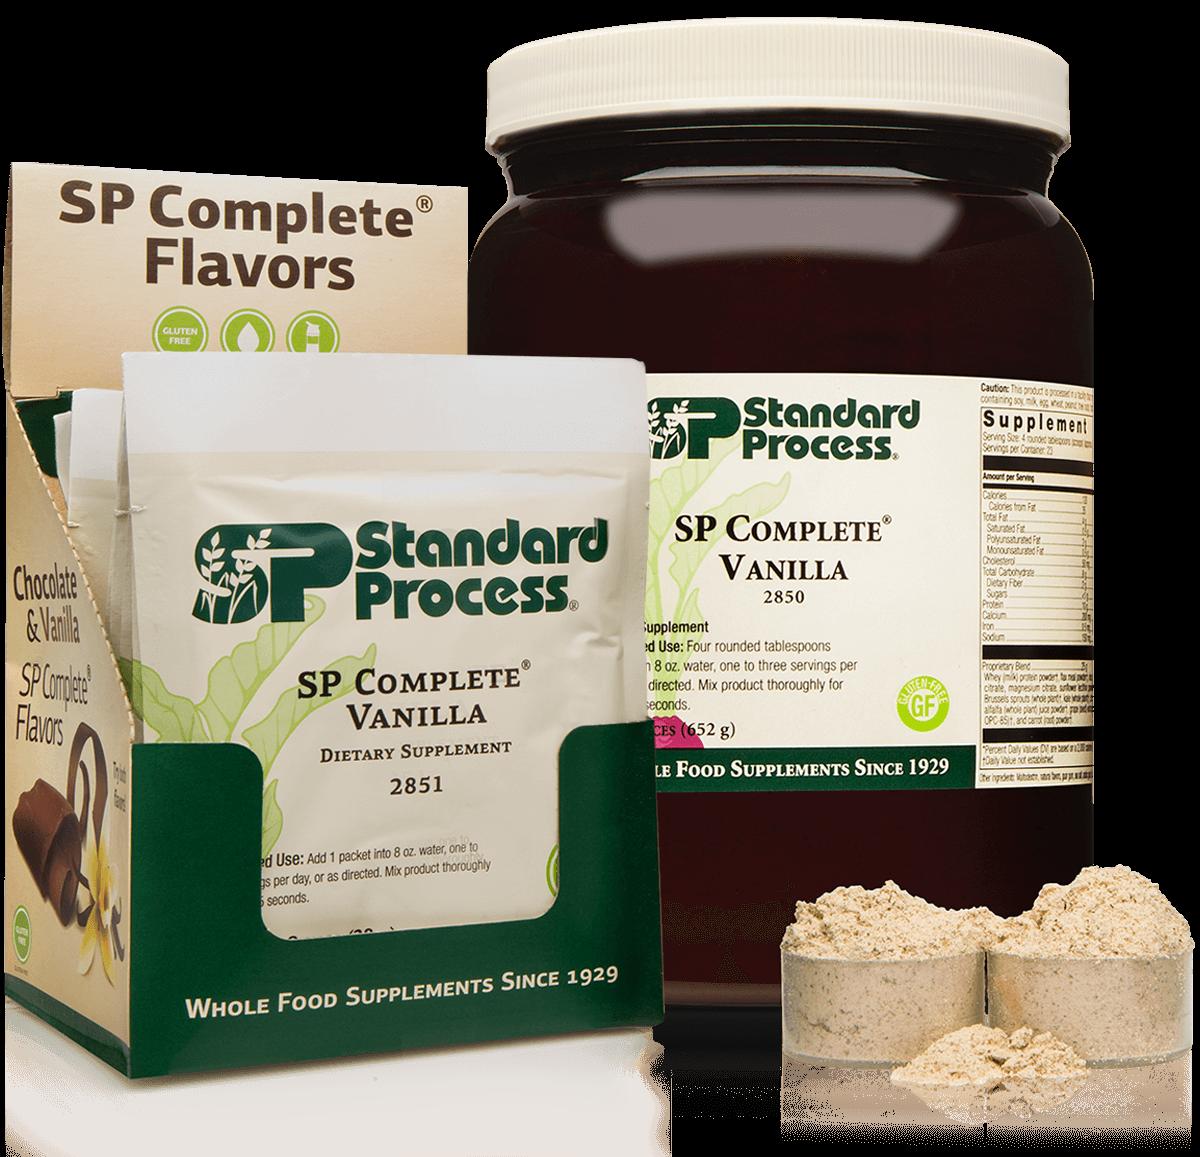 SP Complete® Vanilla, 23 oz (652 g)